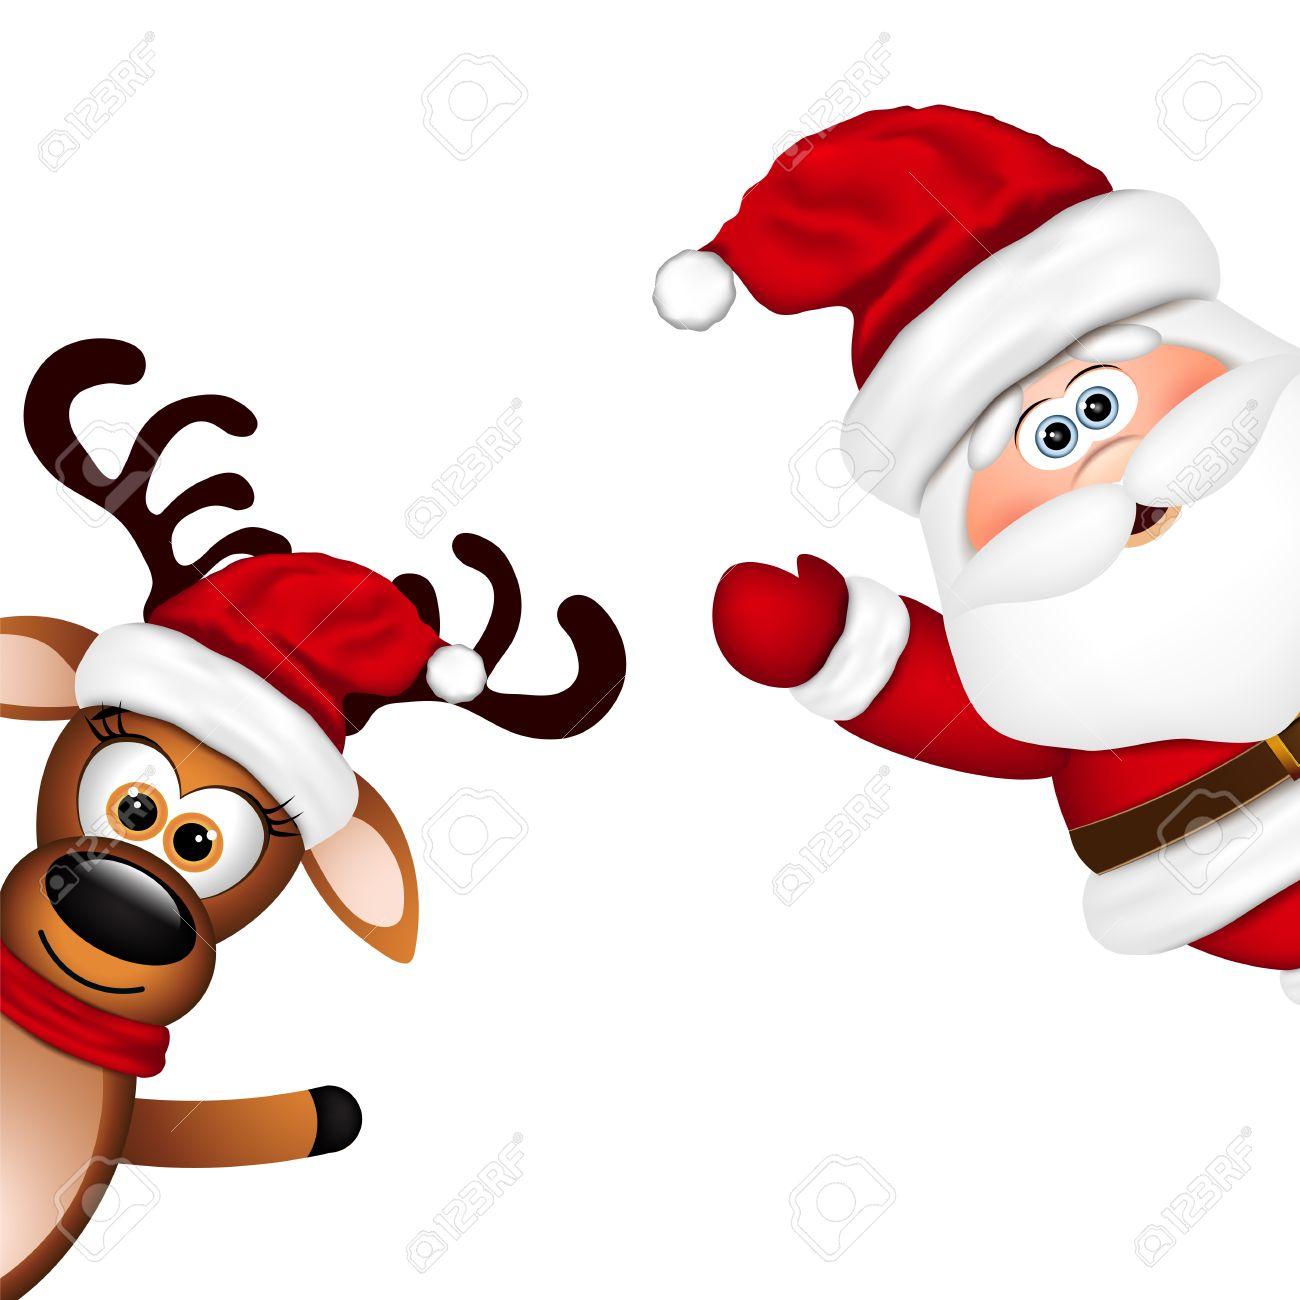 16,540 Santas Reindeer Stock Vector Illustration And Royalty Free ...